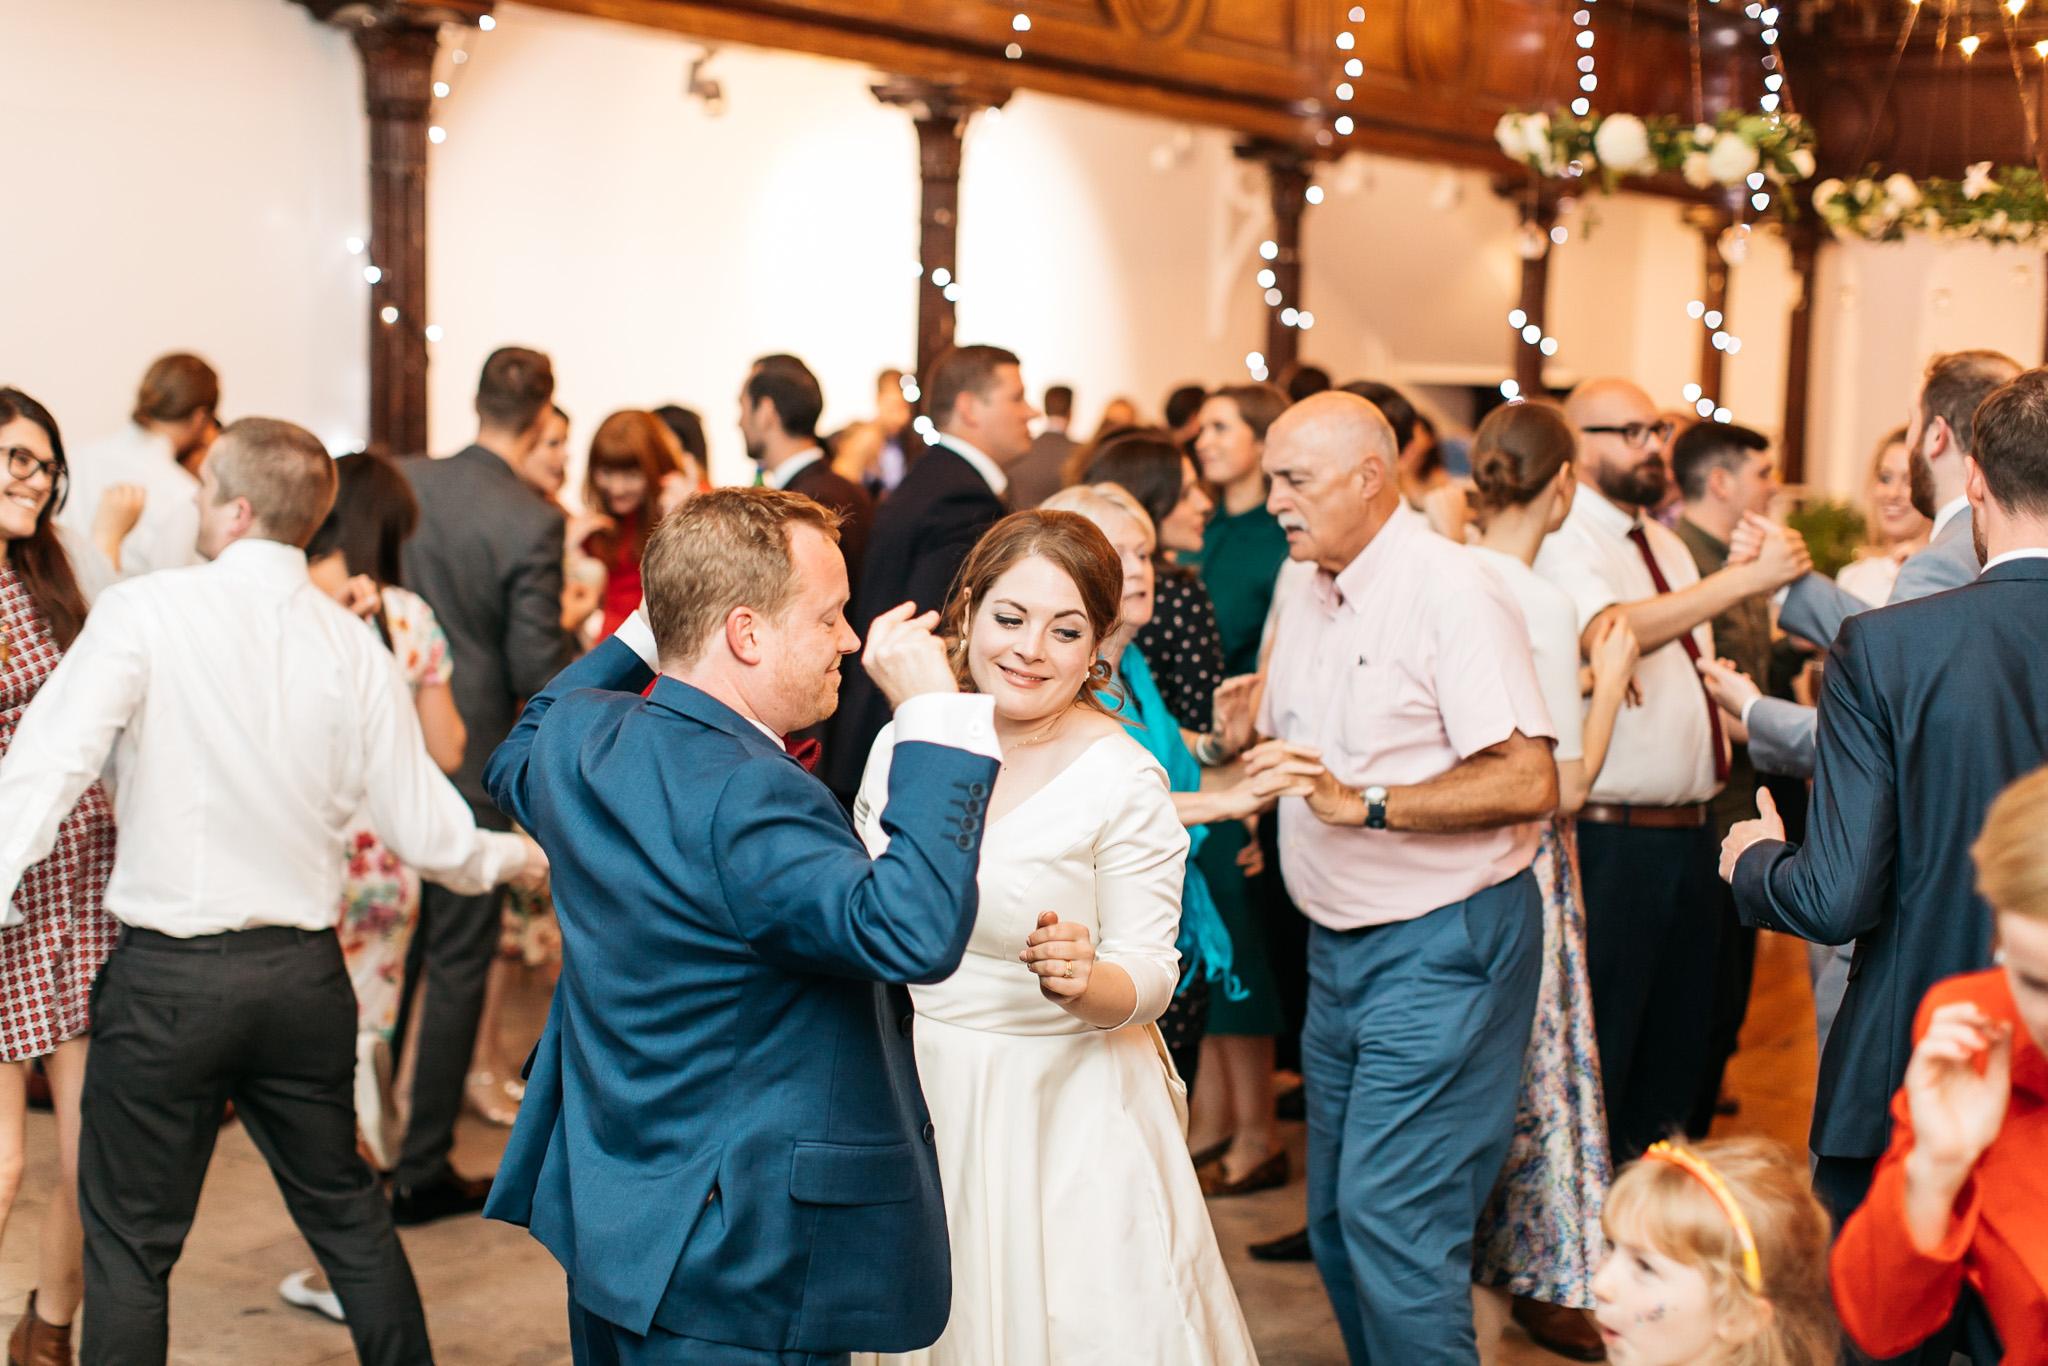 st_andrews_fabrica_brighton_wedding_623.jpg